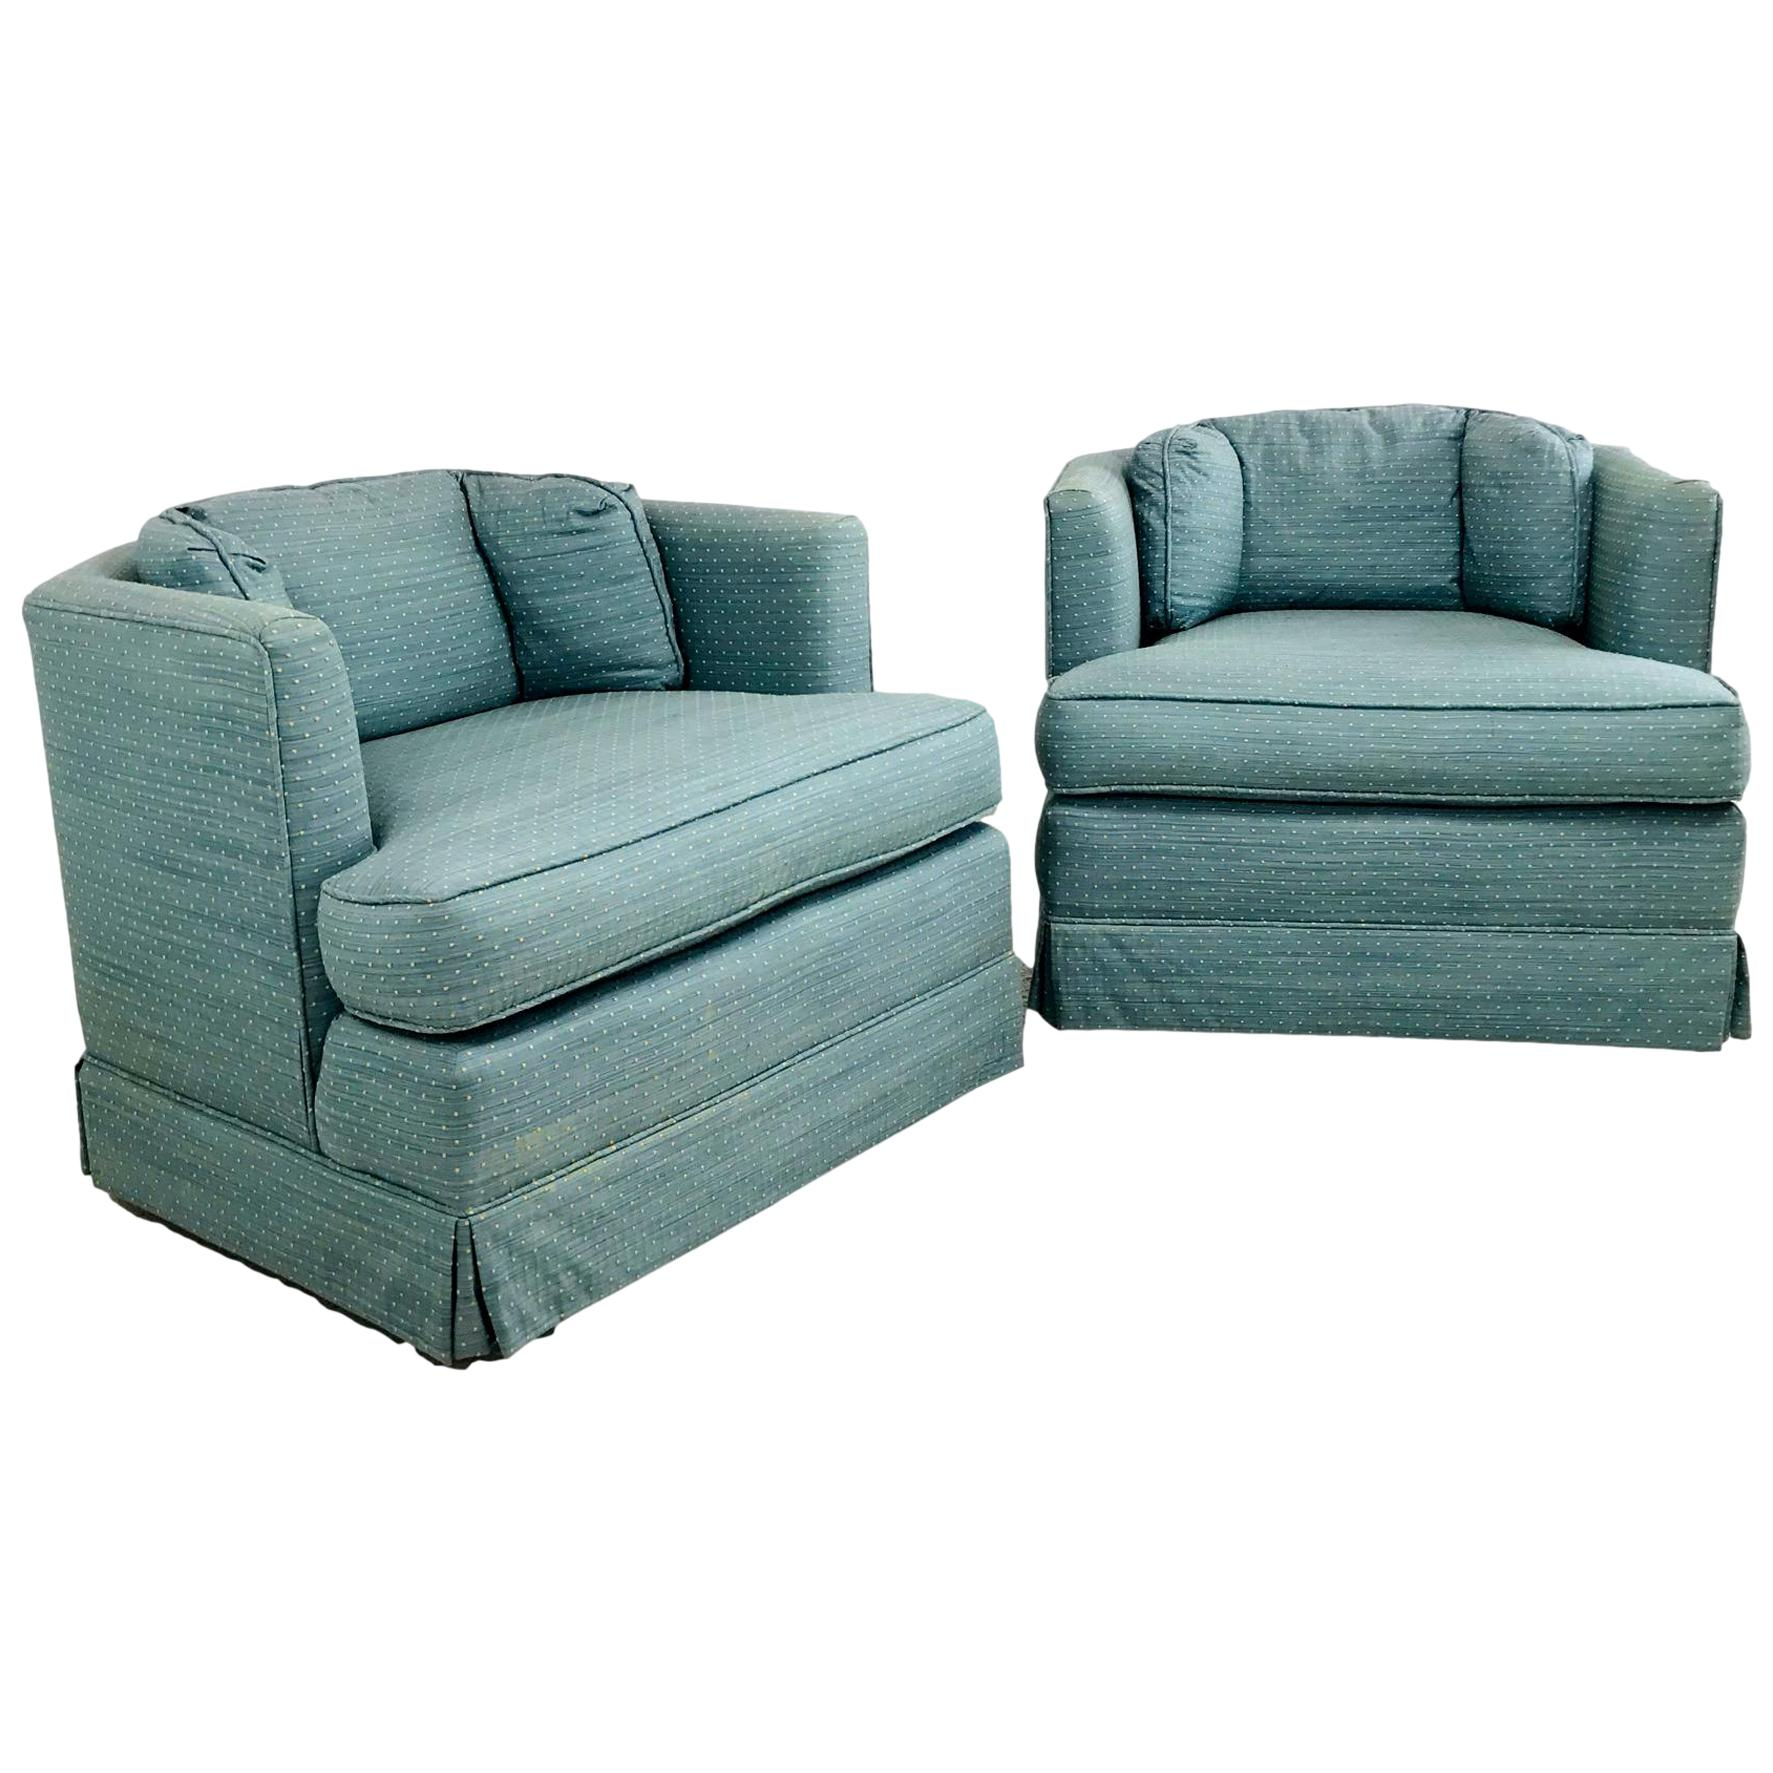 Pair of Hexagon Swivel Lounge Chairs